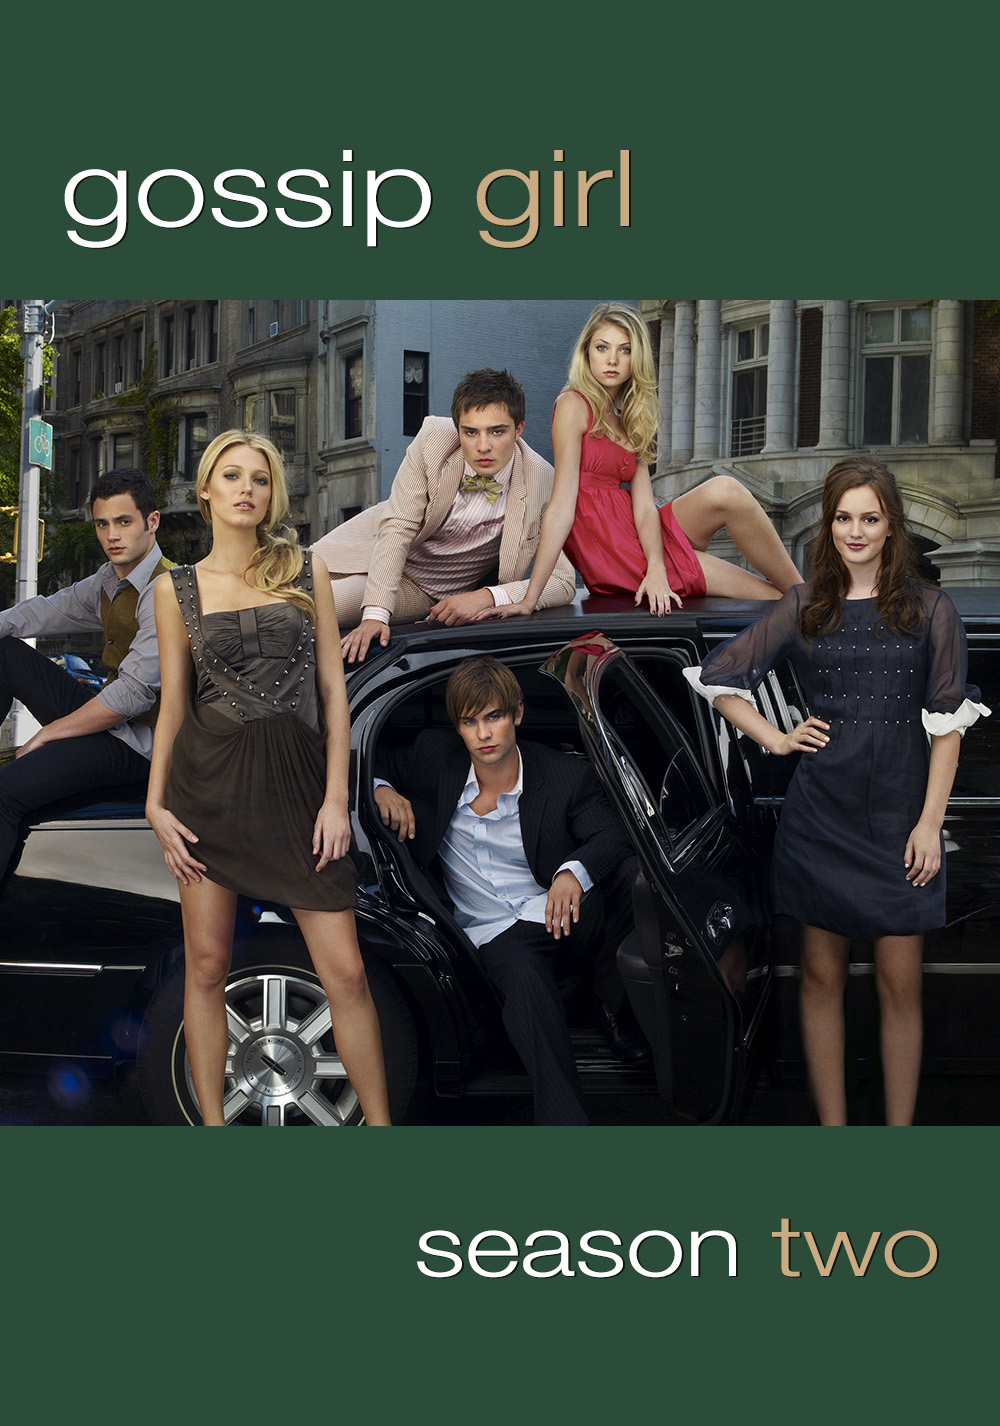 Gossip Girl - Season 1 f2movies | Watch online Gossip Girl ...